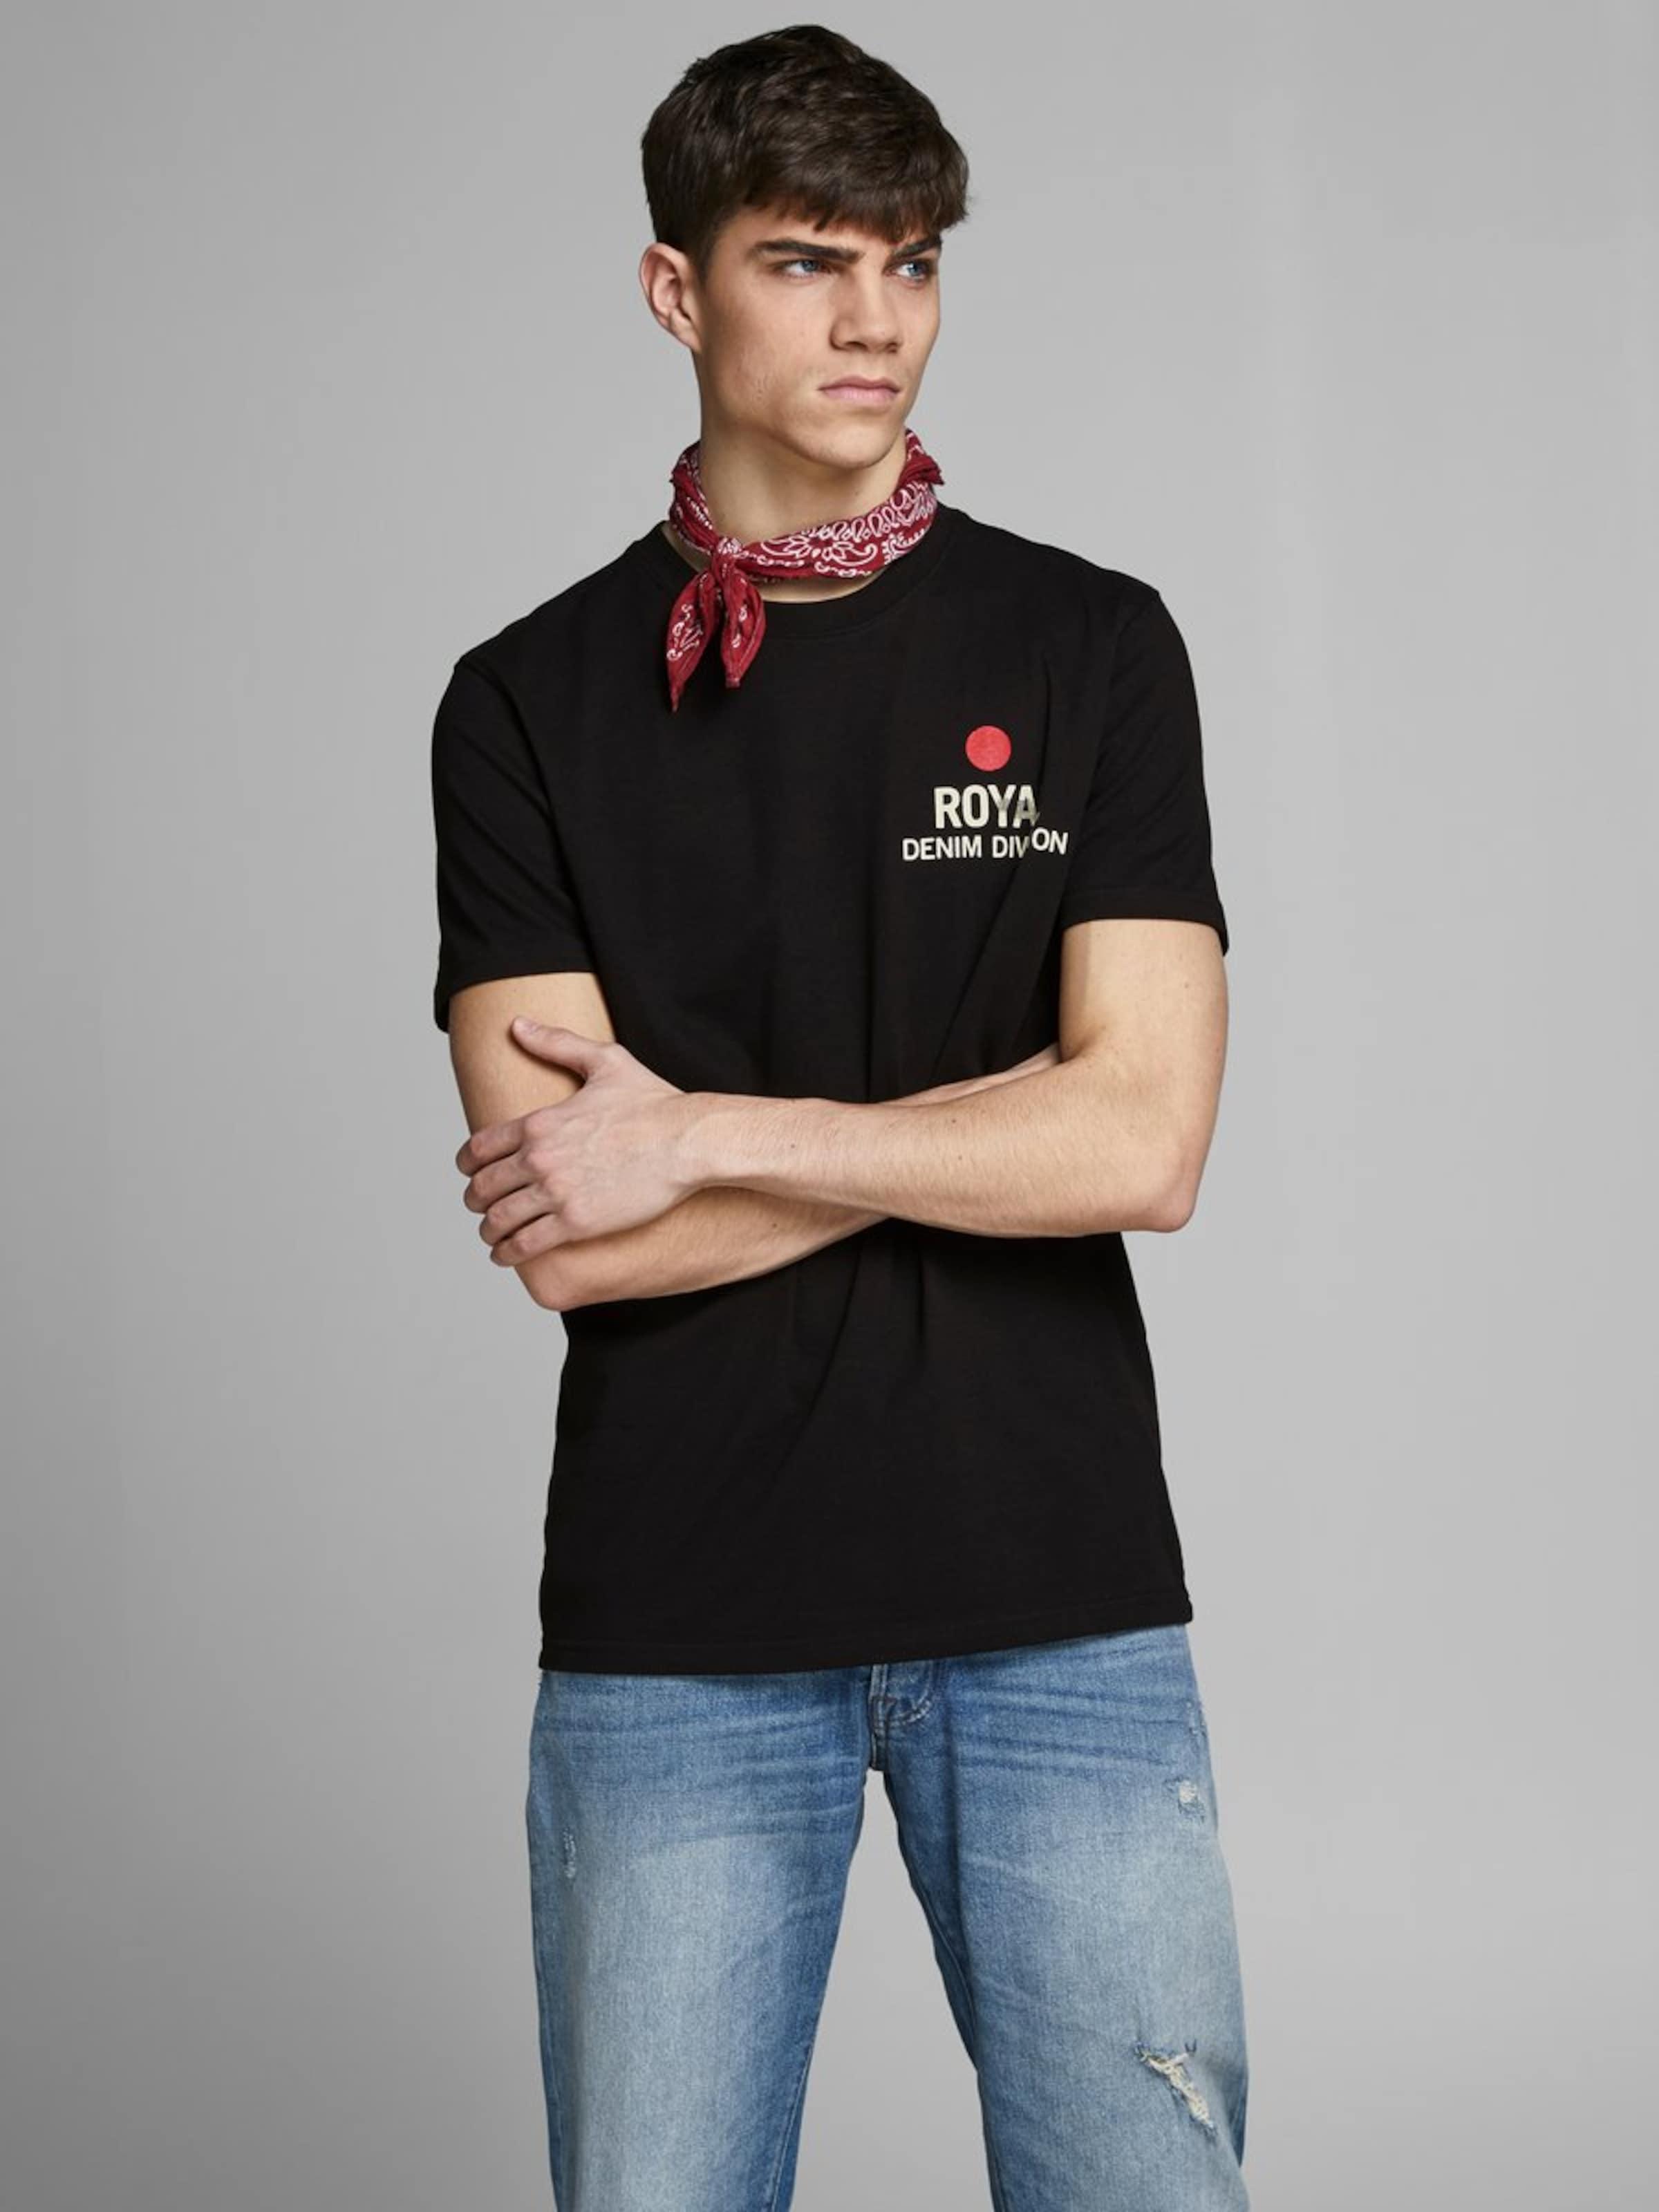 Jackamp; shirt T In Jones RotSchwarz Weiß VqUzpSGM